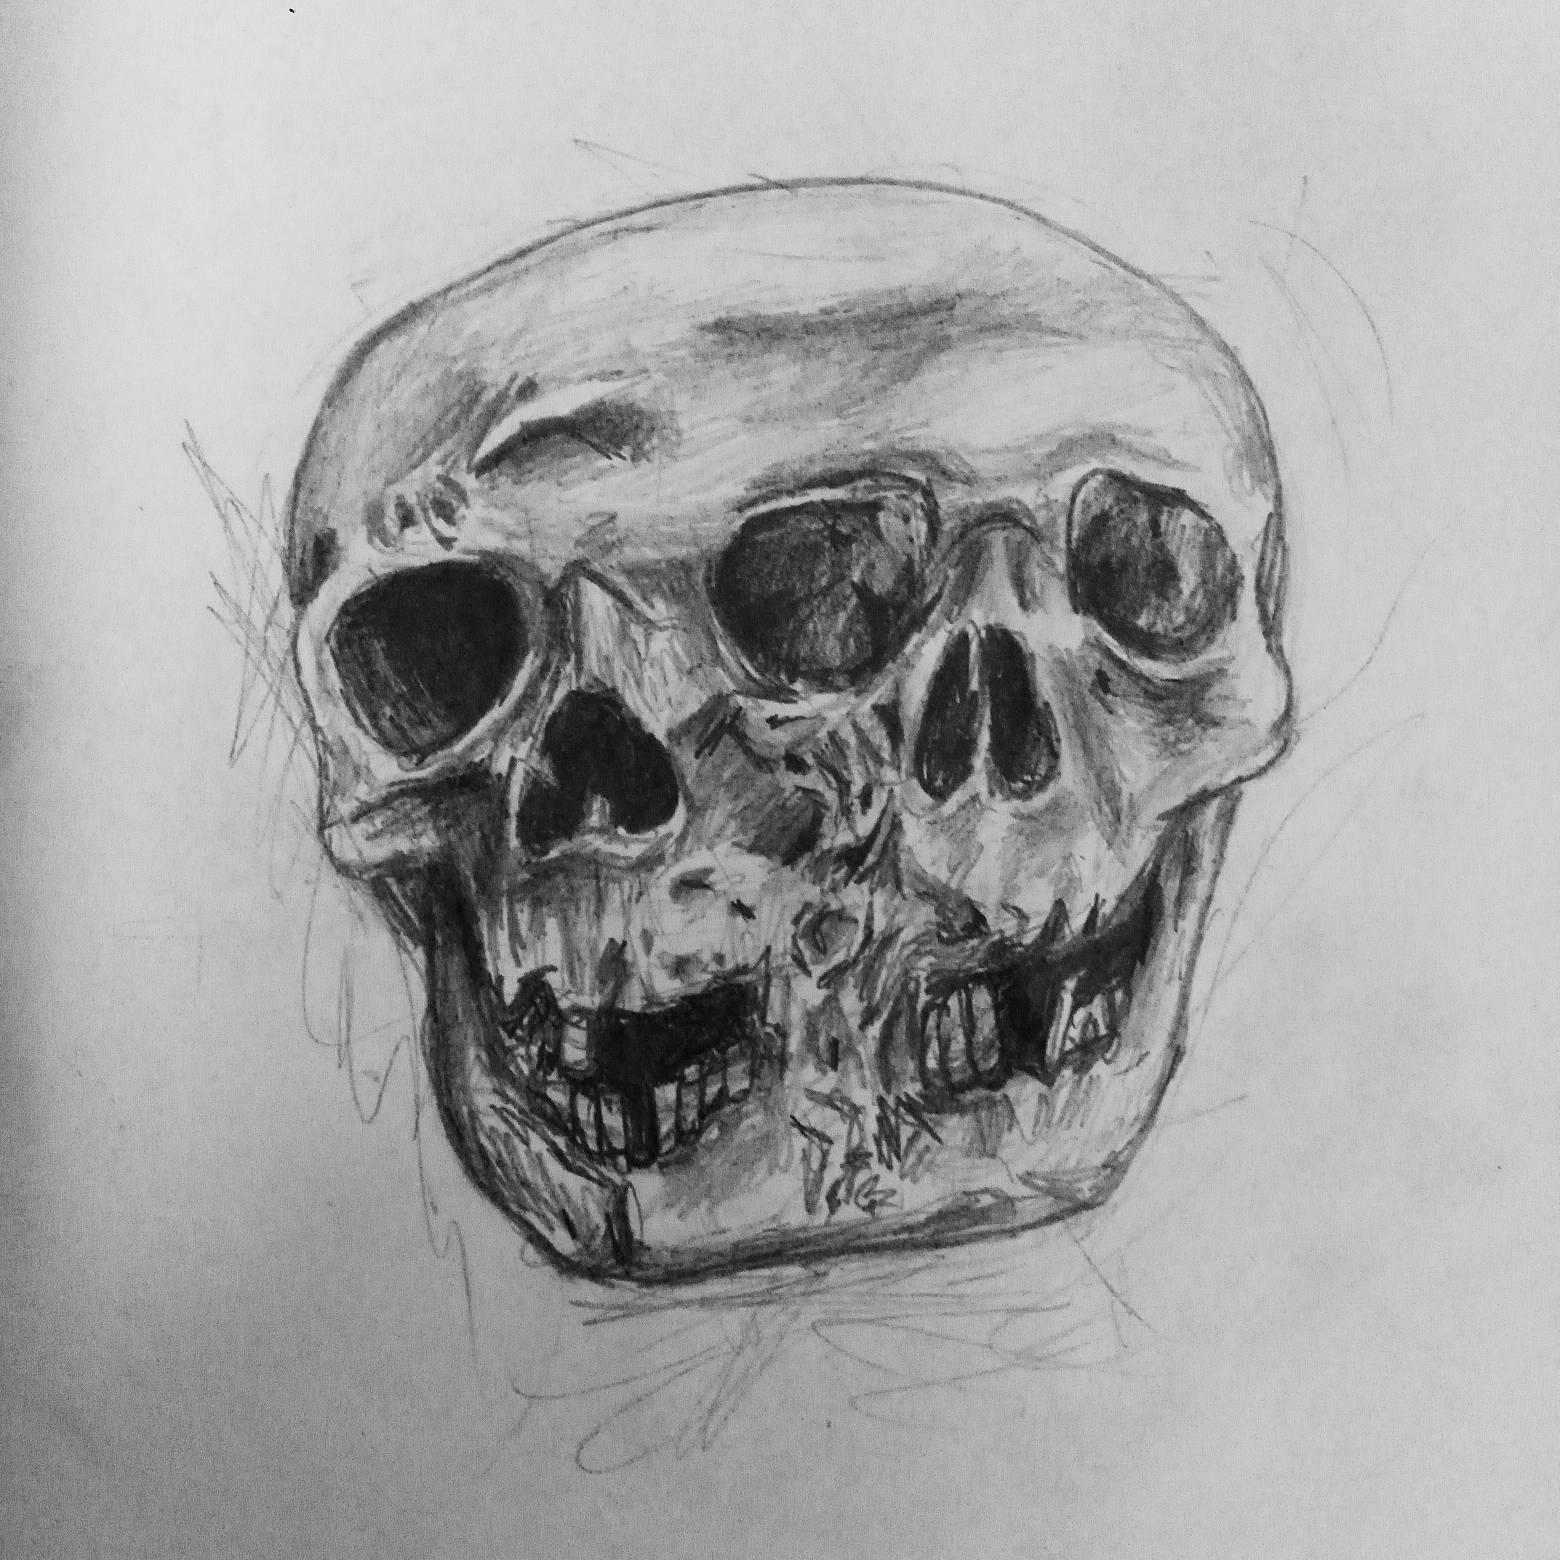 Fused skull sketch